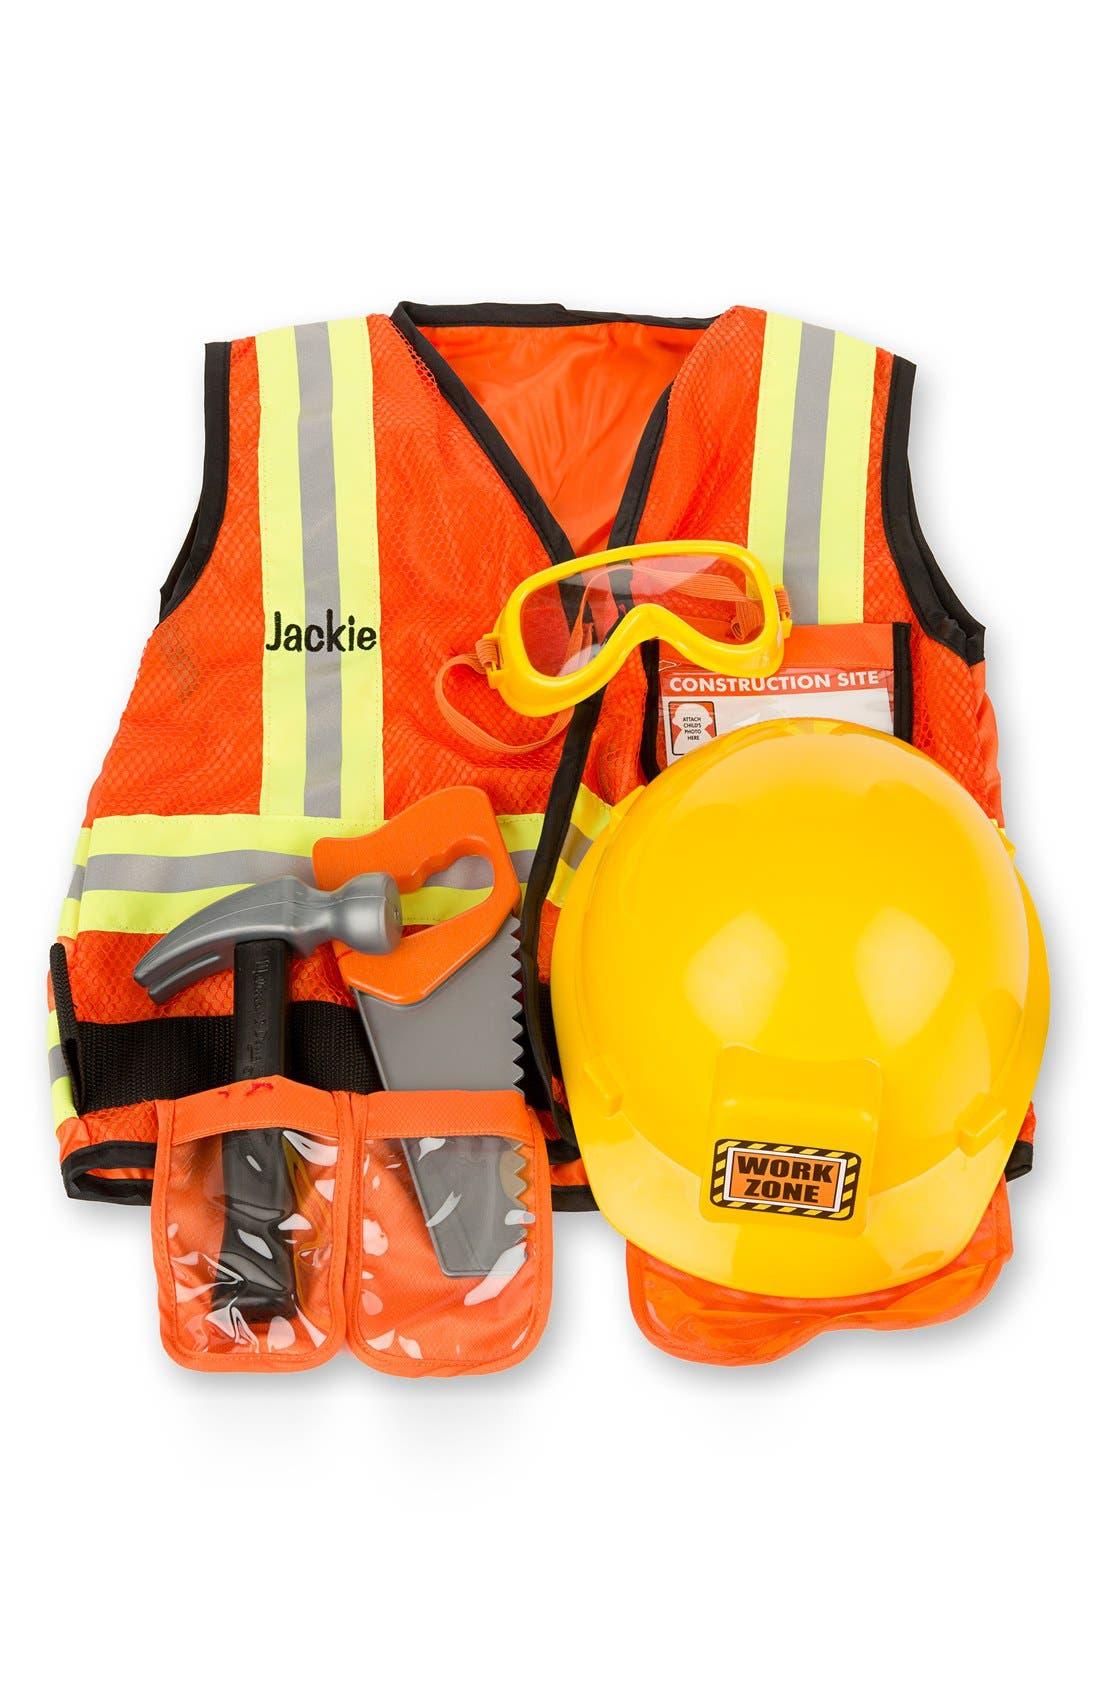 Melissa & Doug 'Construction Worker' Personalized Costume Set (Toddler)